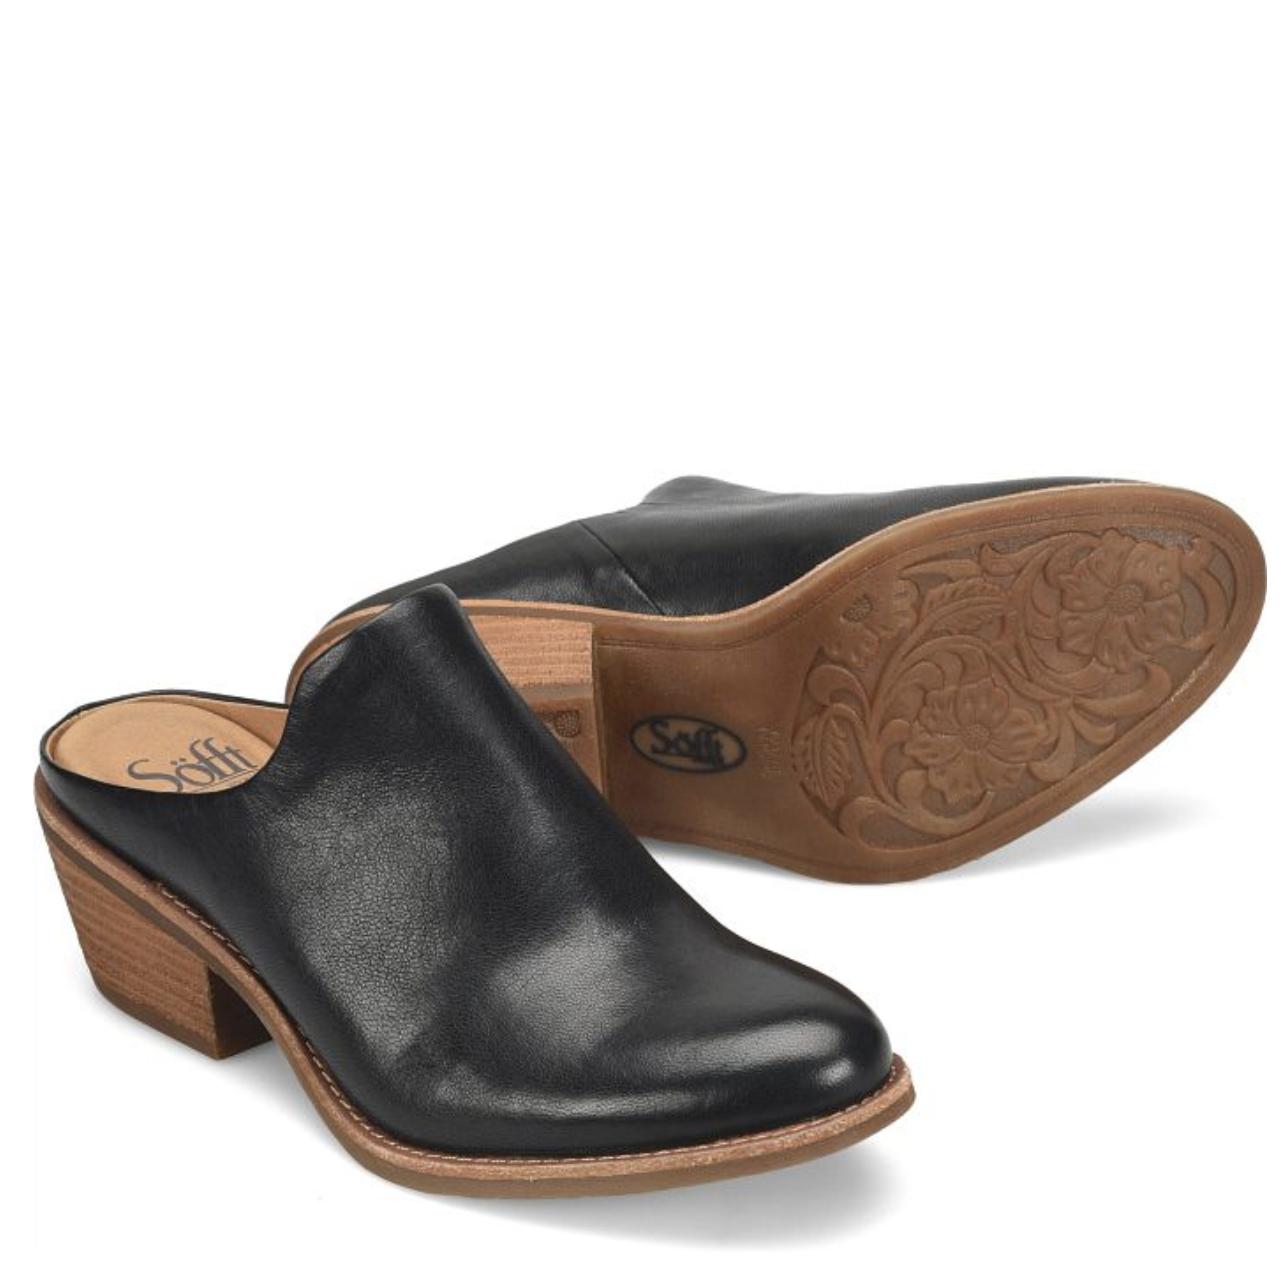 Sofft Shoe Company Ameera-Black